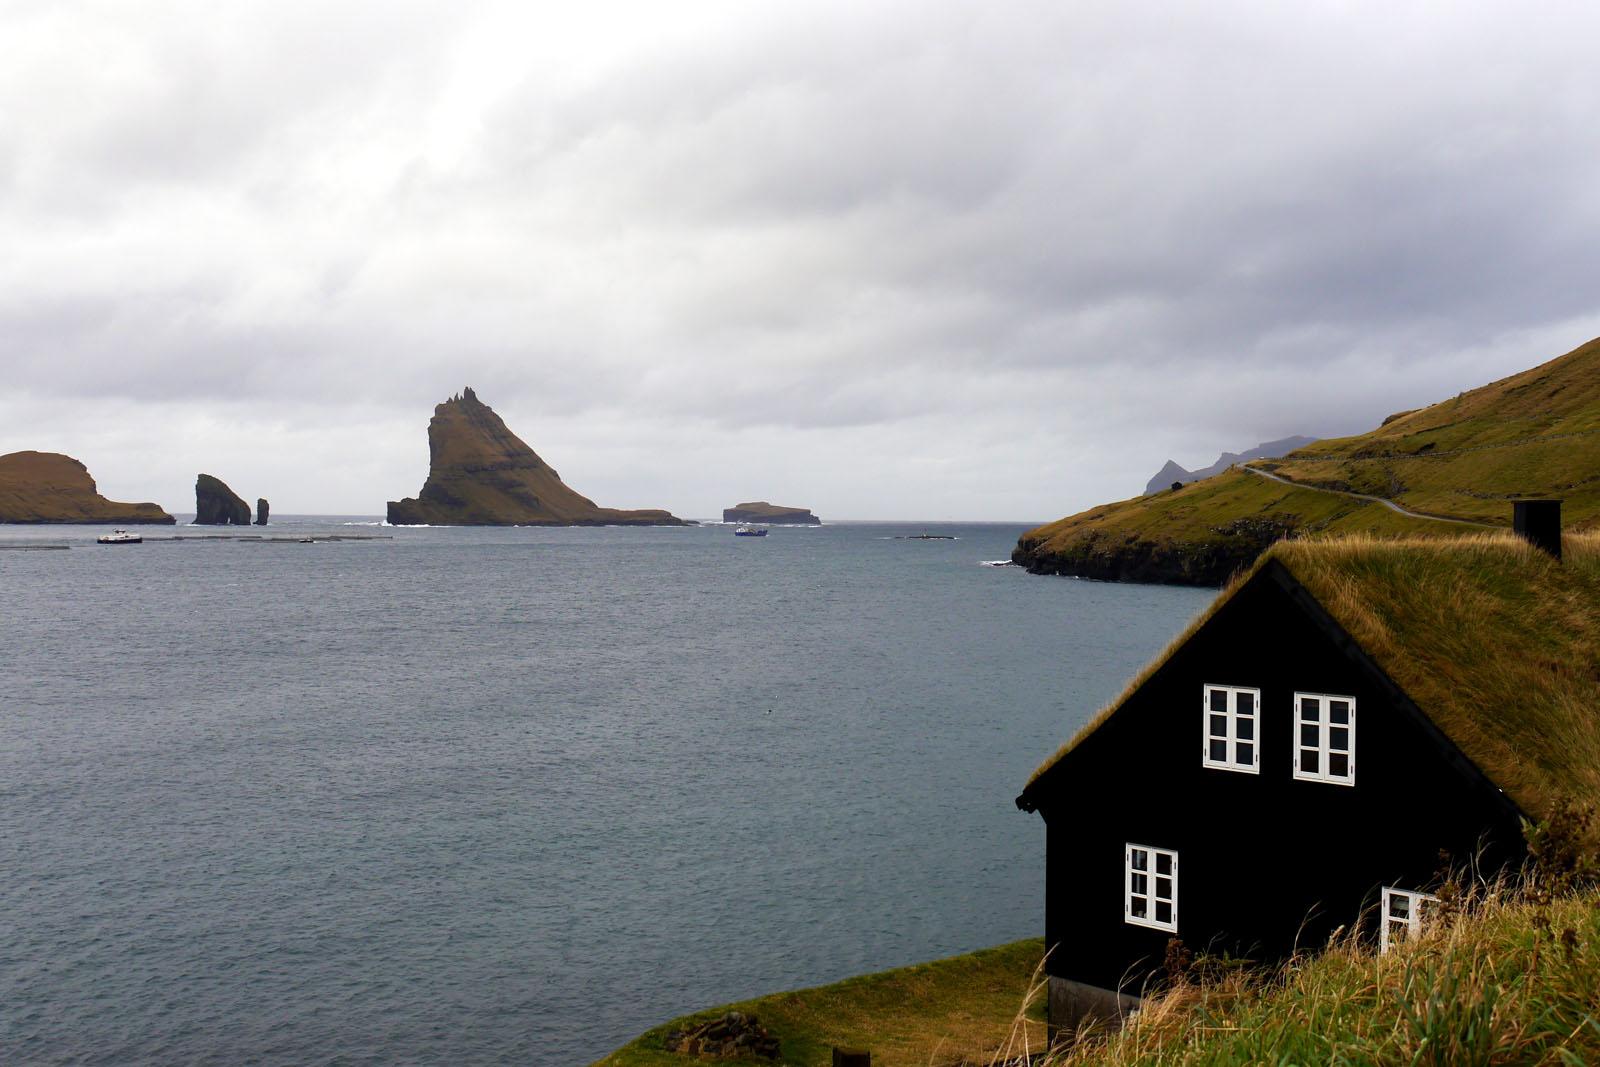 Bour-Faroer Inseln-Haus mit Grasdach-Vagar-Tindholmur